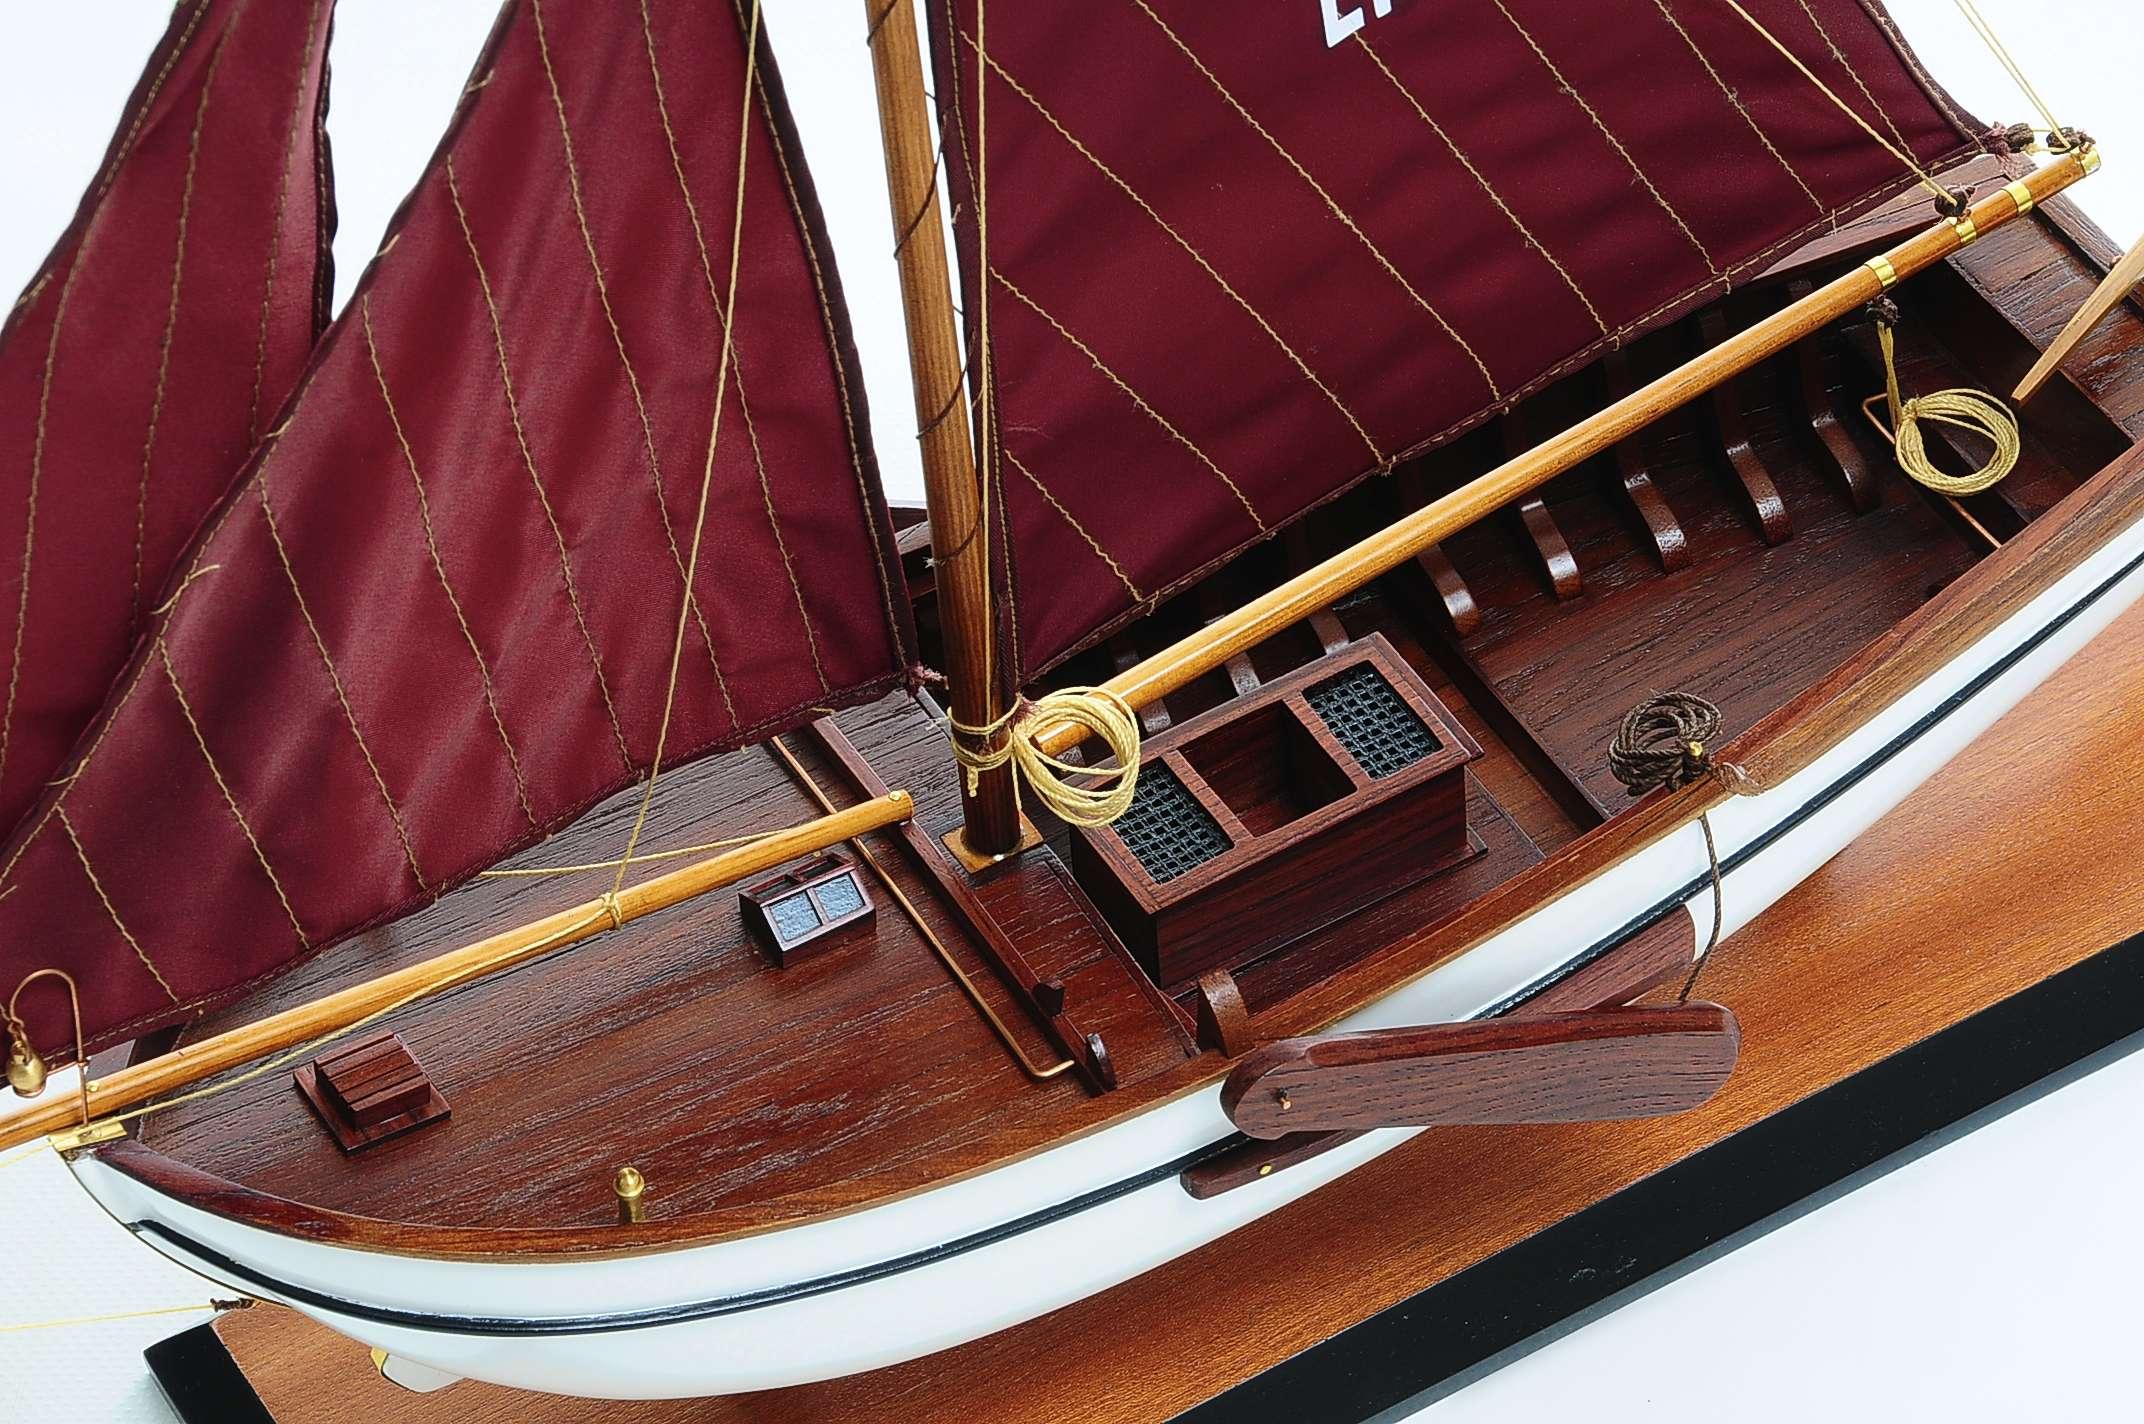 1432-4588-Dutch-Marker-Roundbow-Model-Boat